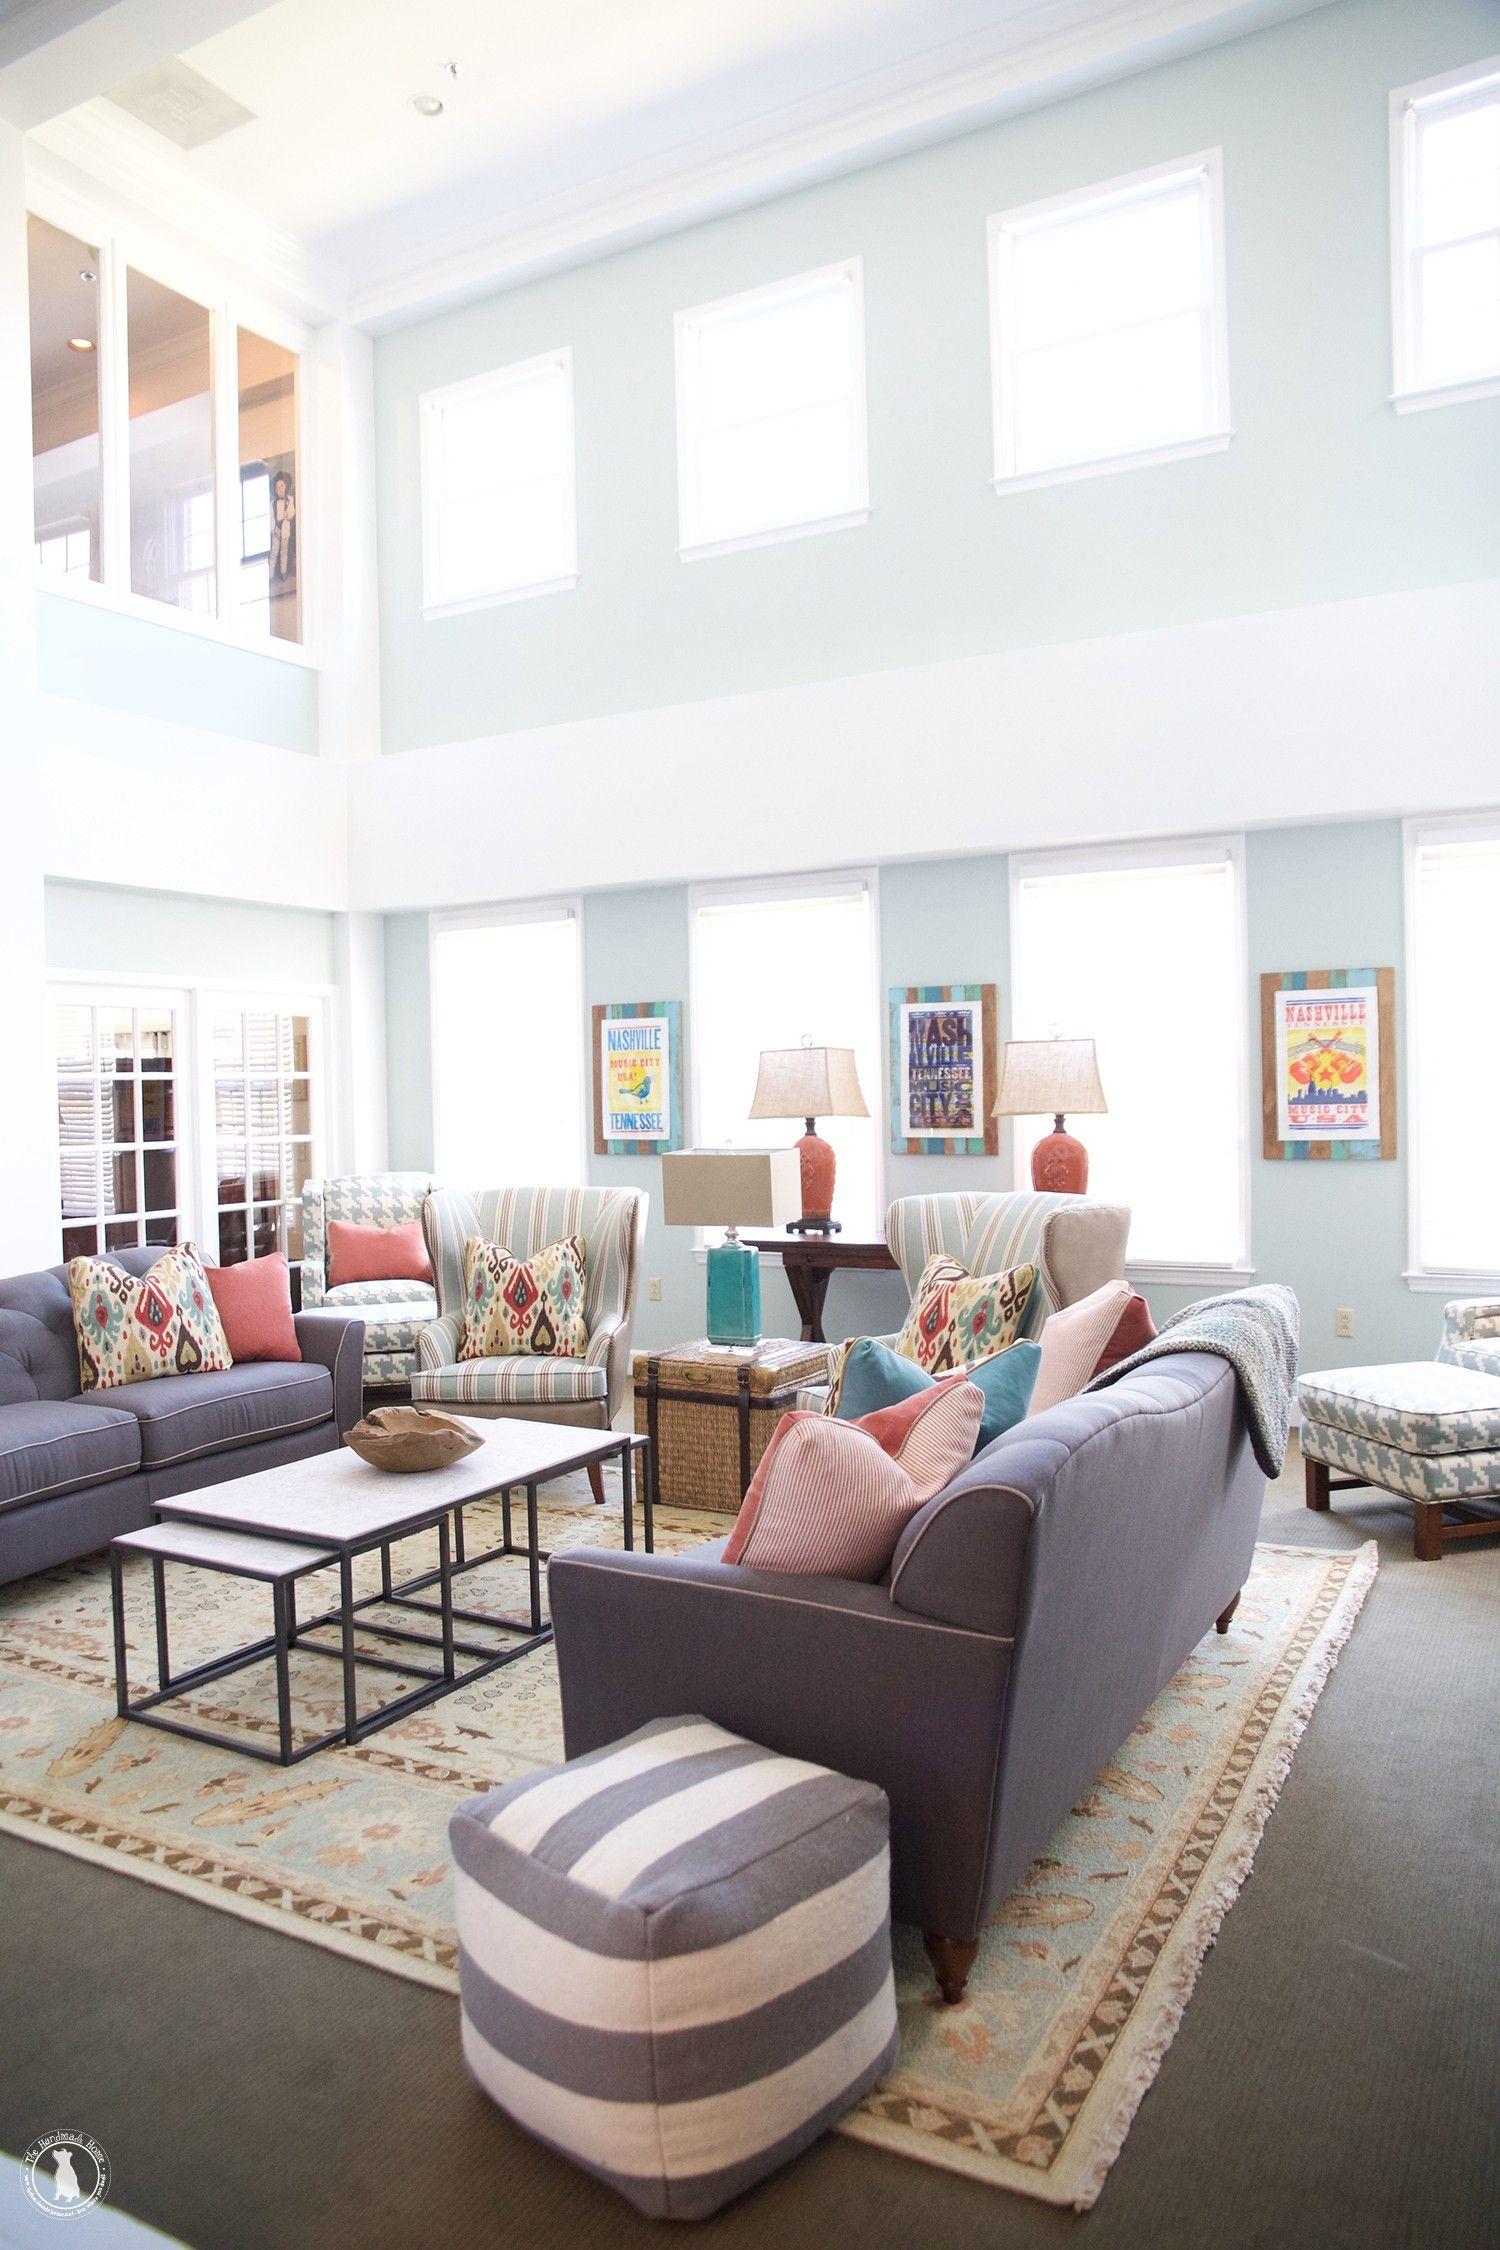 Ronald McDonald House unveils renovated living room | WKRN News 2